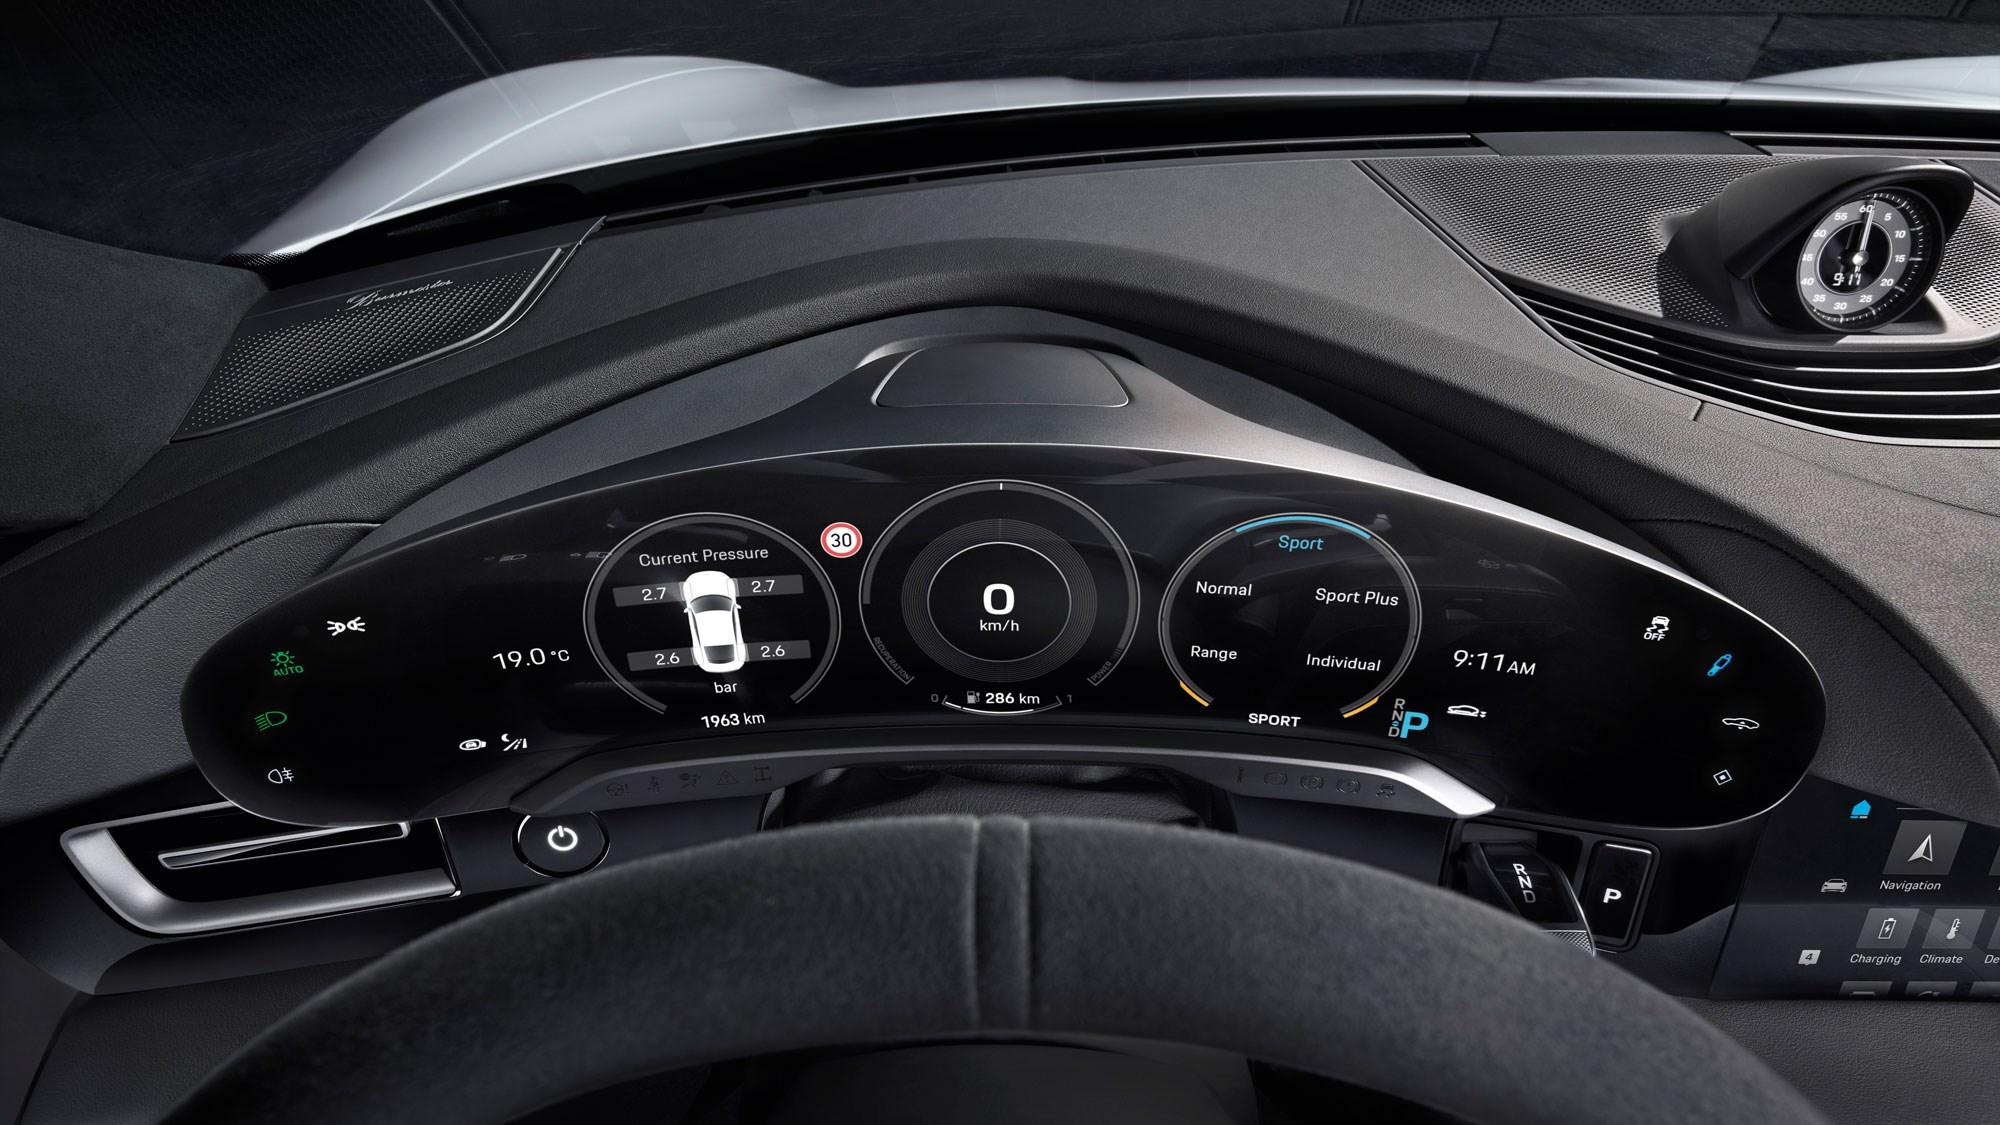 Porsche Taycan 2021 Updates Include More Tech More Speed Car Magazine